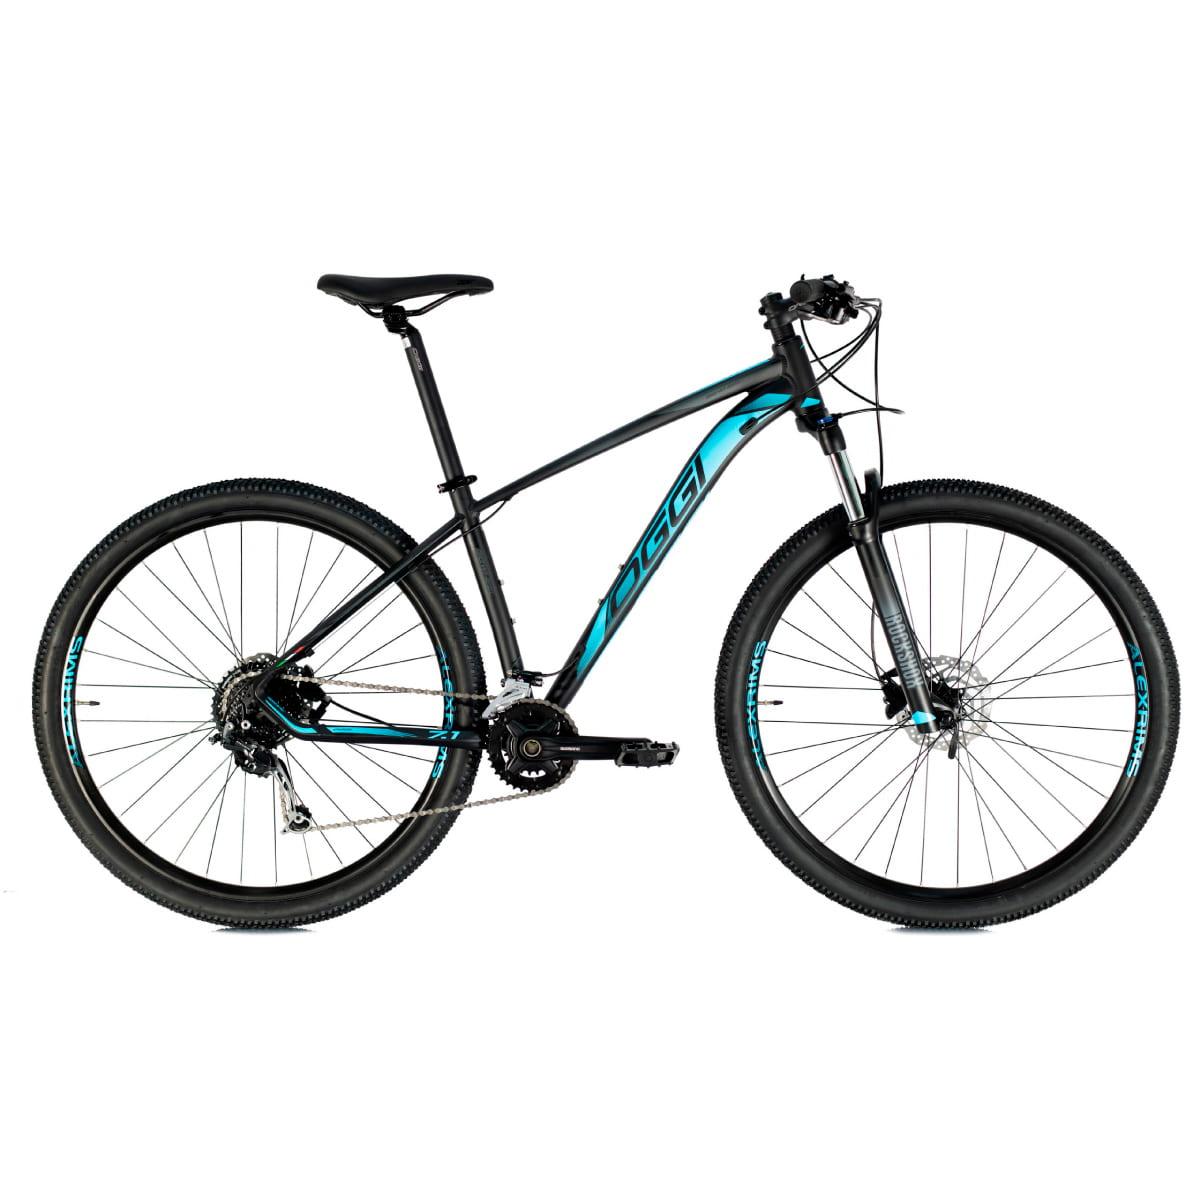 Bike Oggi 7.1 2021 BiG Whell Original 18 V Preto Azul